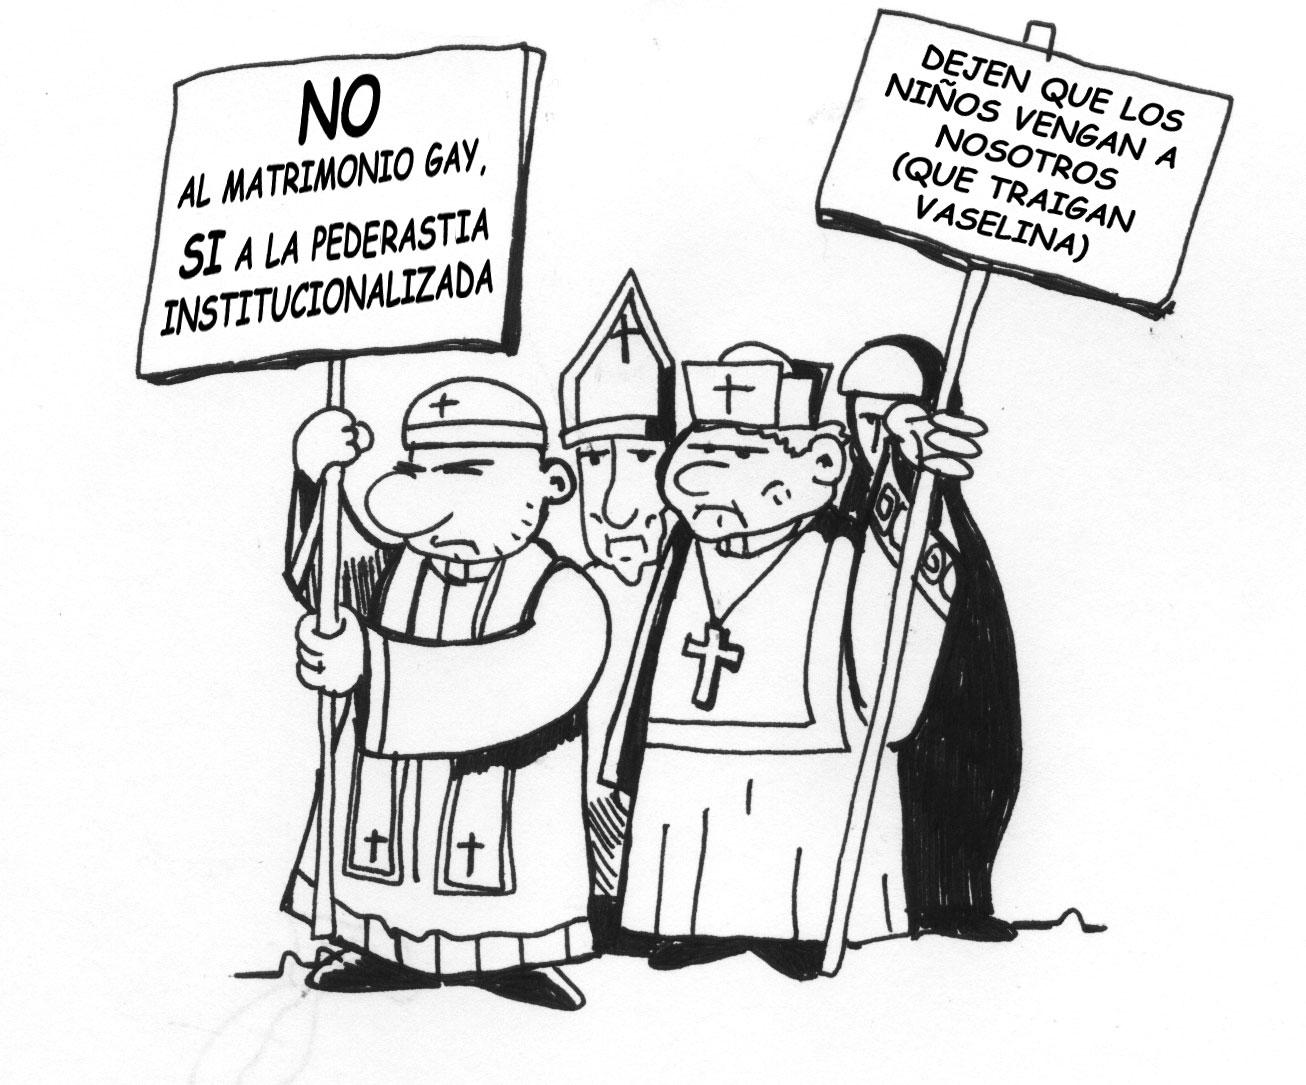 Caricaturas Criticas De Pastores De Iglesias Cristianas